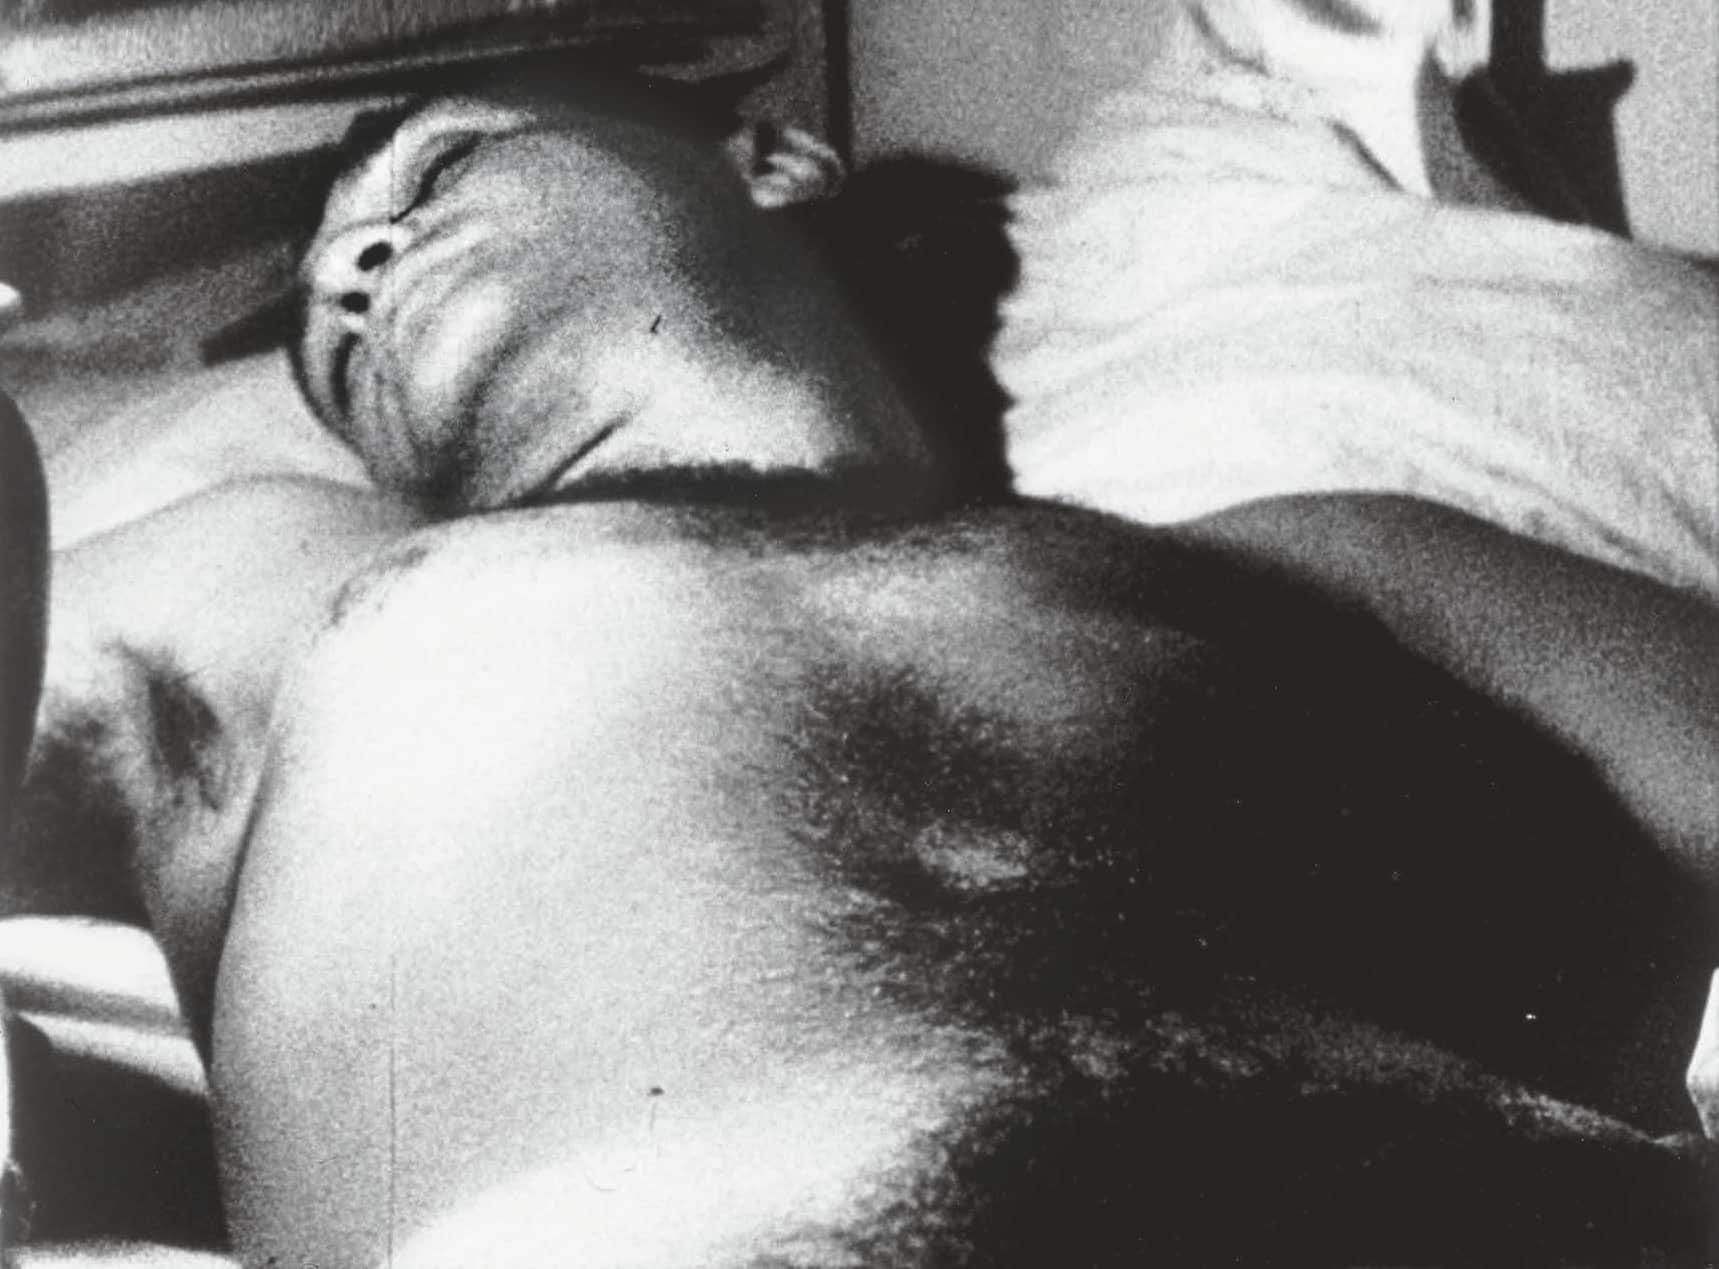 Sleeping With Andy Warhol